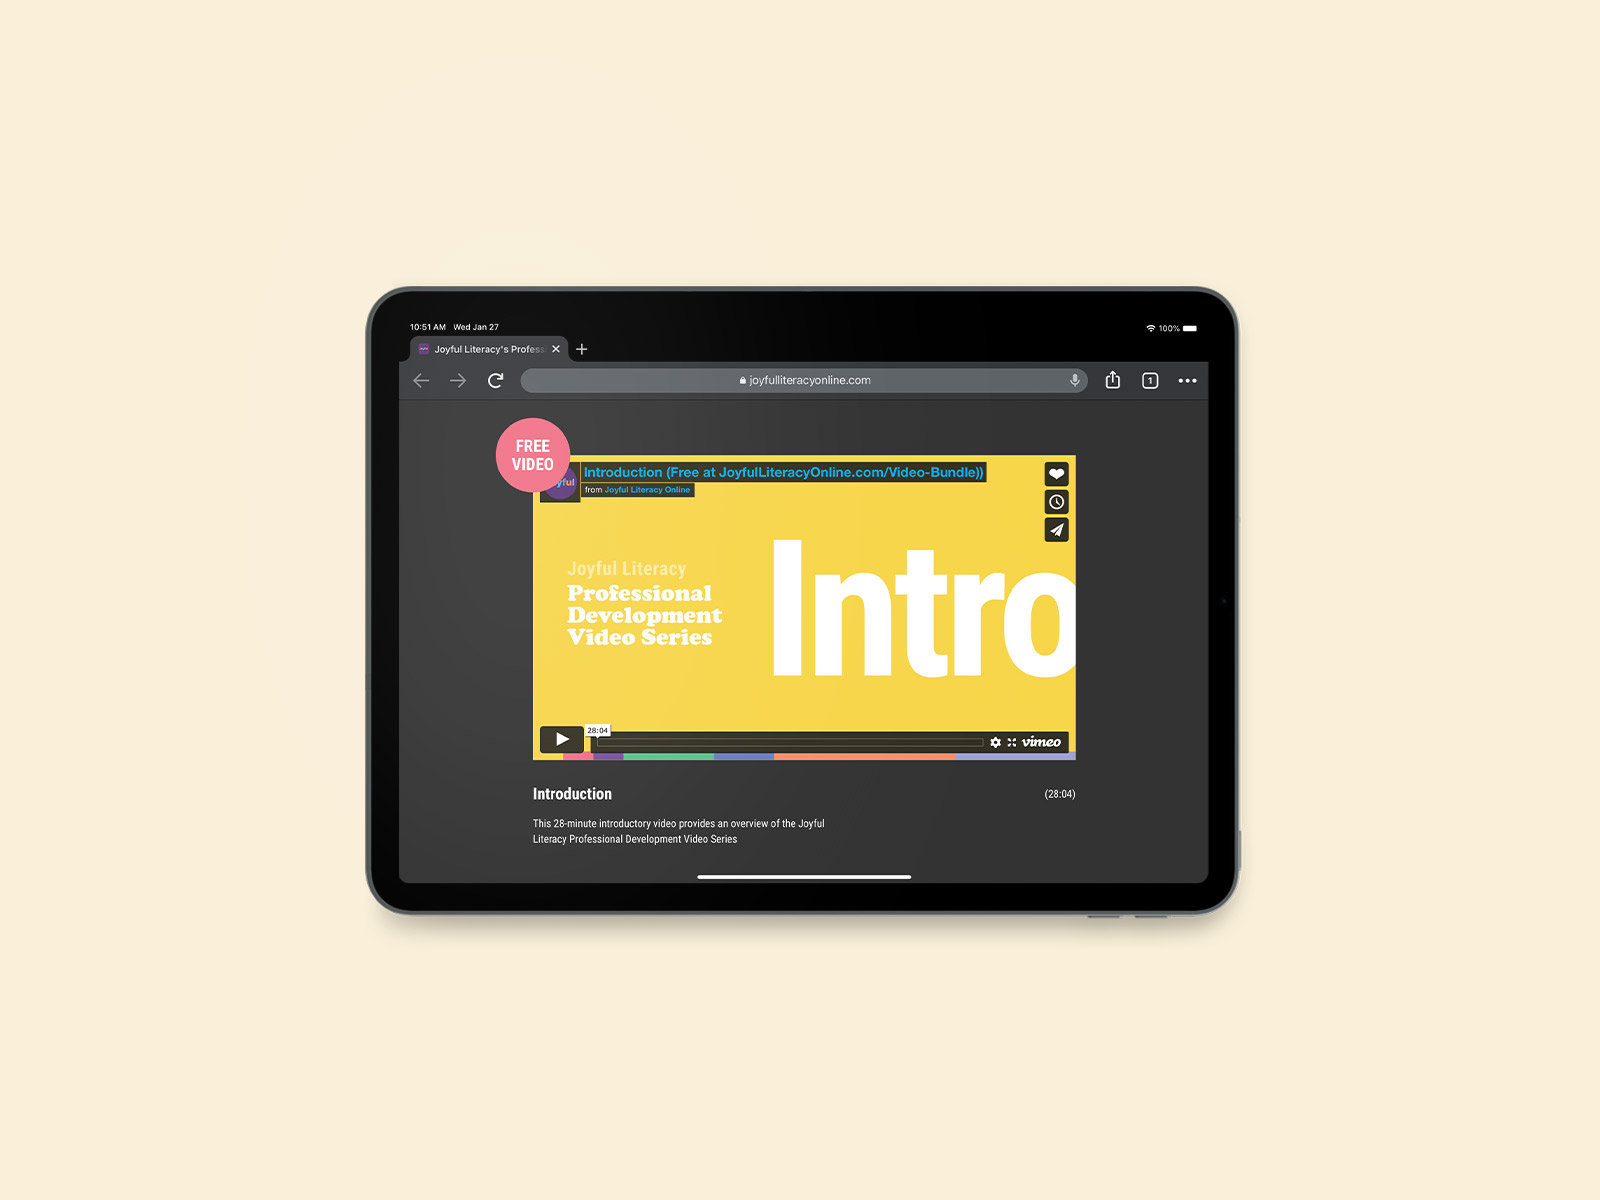 website design on ipad pro for joyful literacy brand identity design